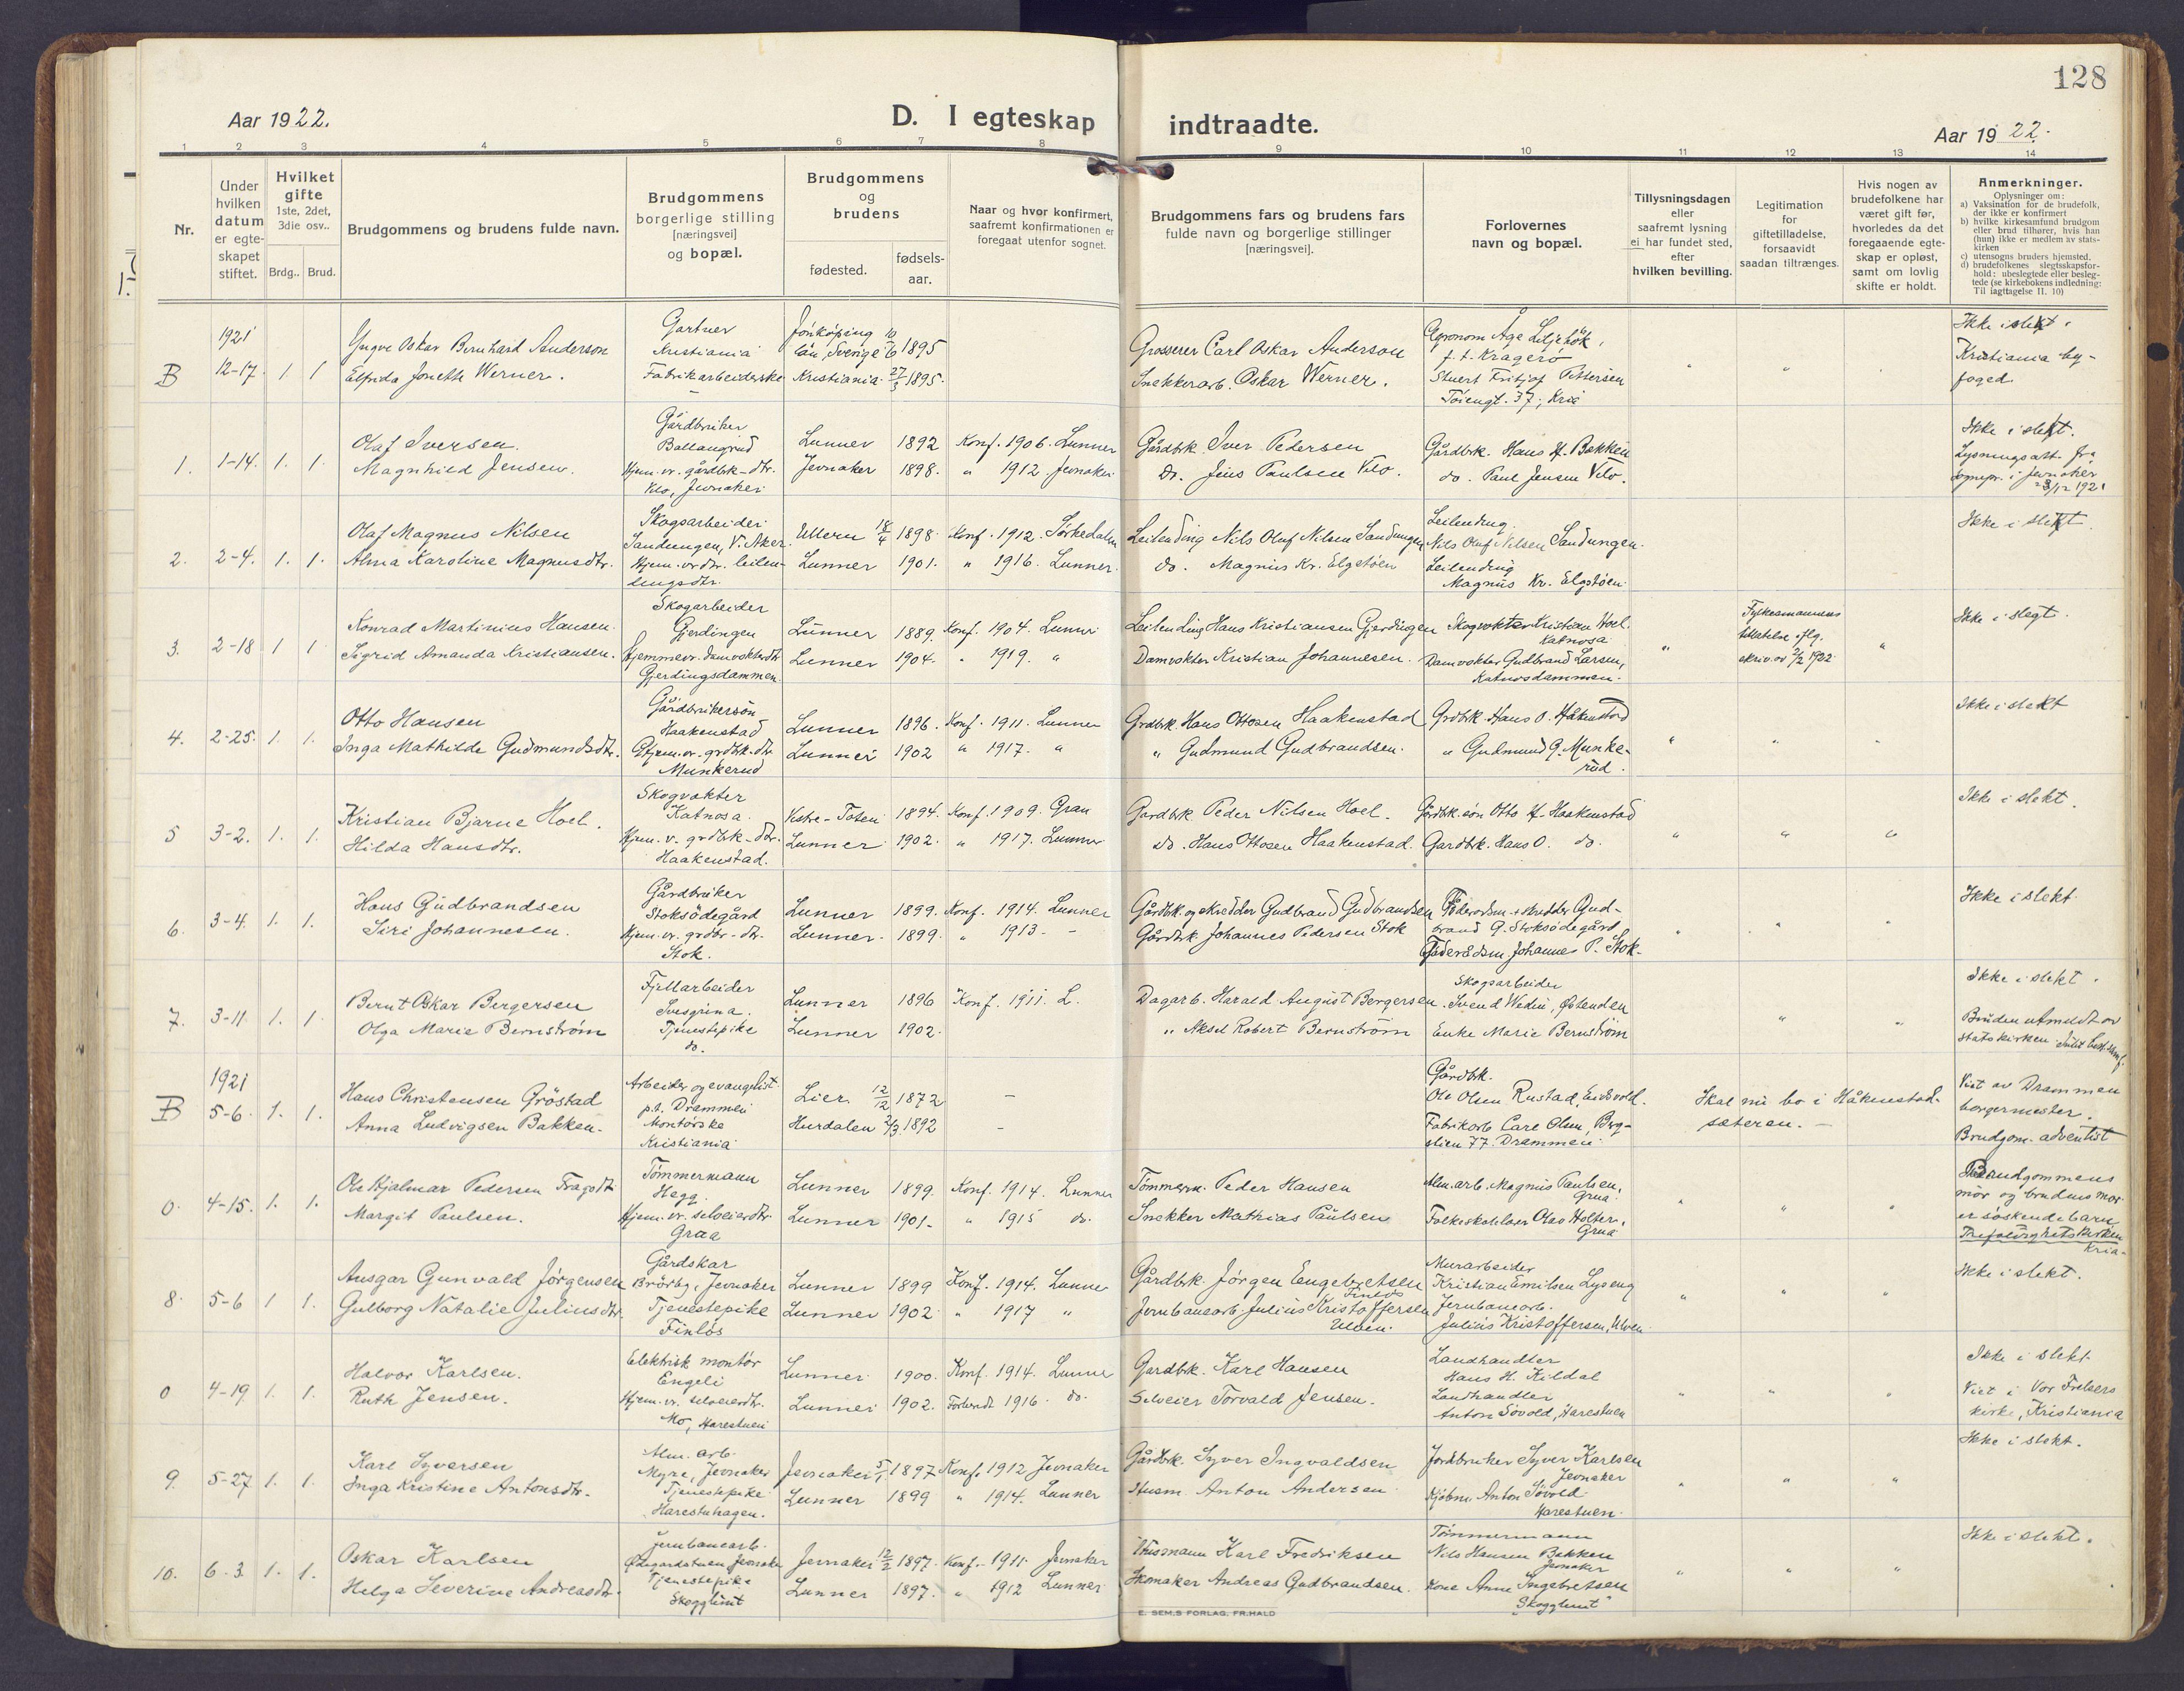 SAH, Lunner prestekontor, H/Ha/Haa/L0002: Ministerialbok nr. 2, 1922-1931, s. 128